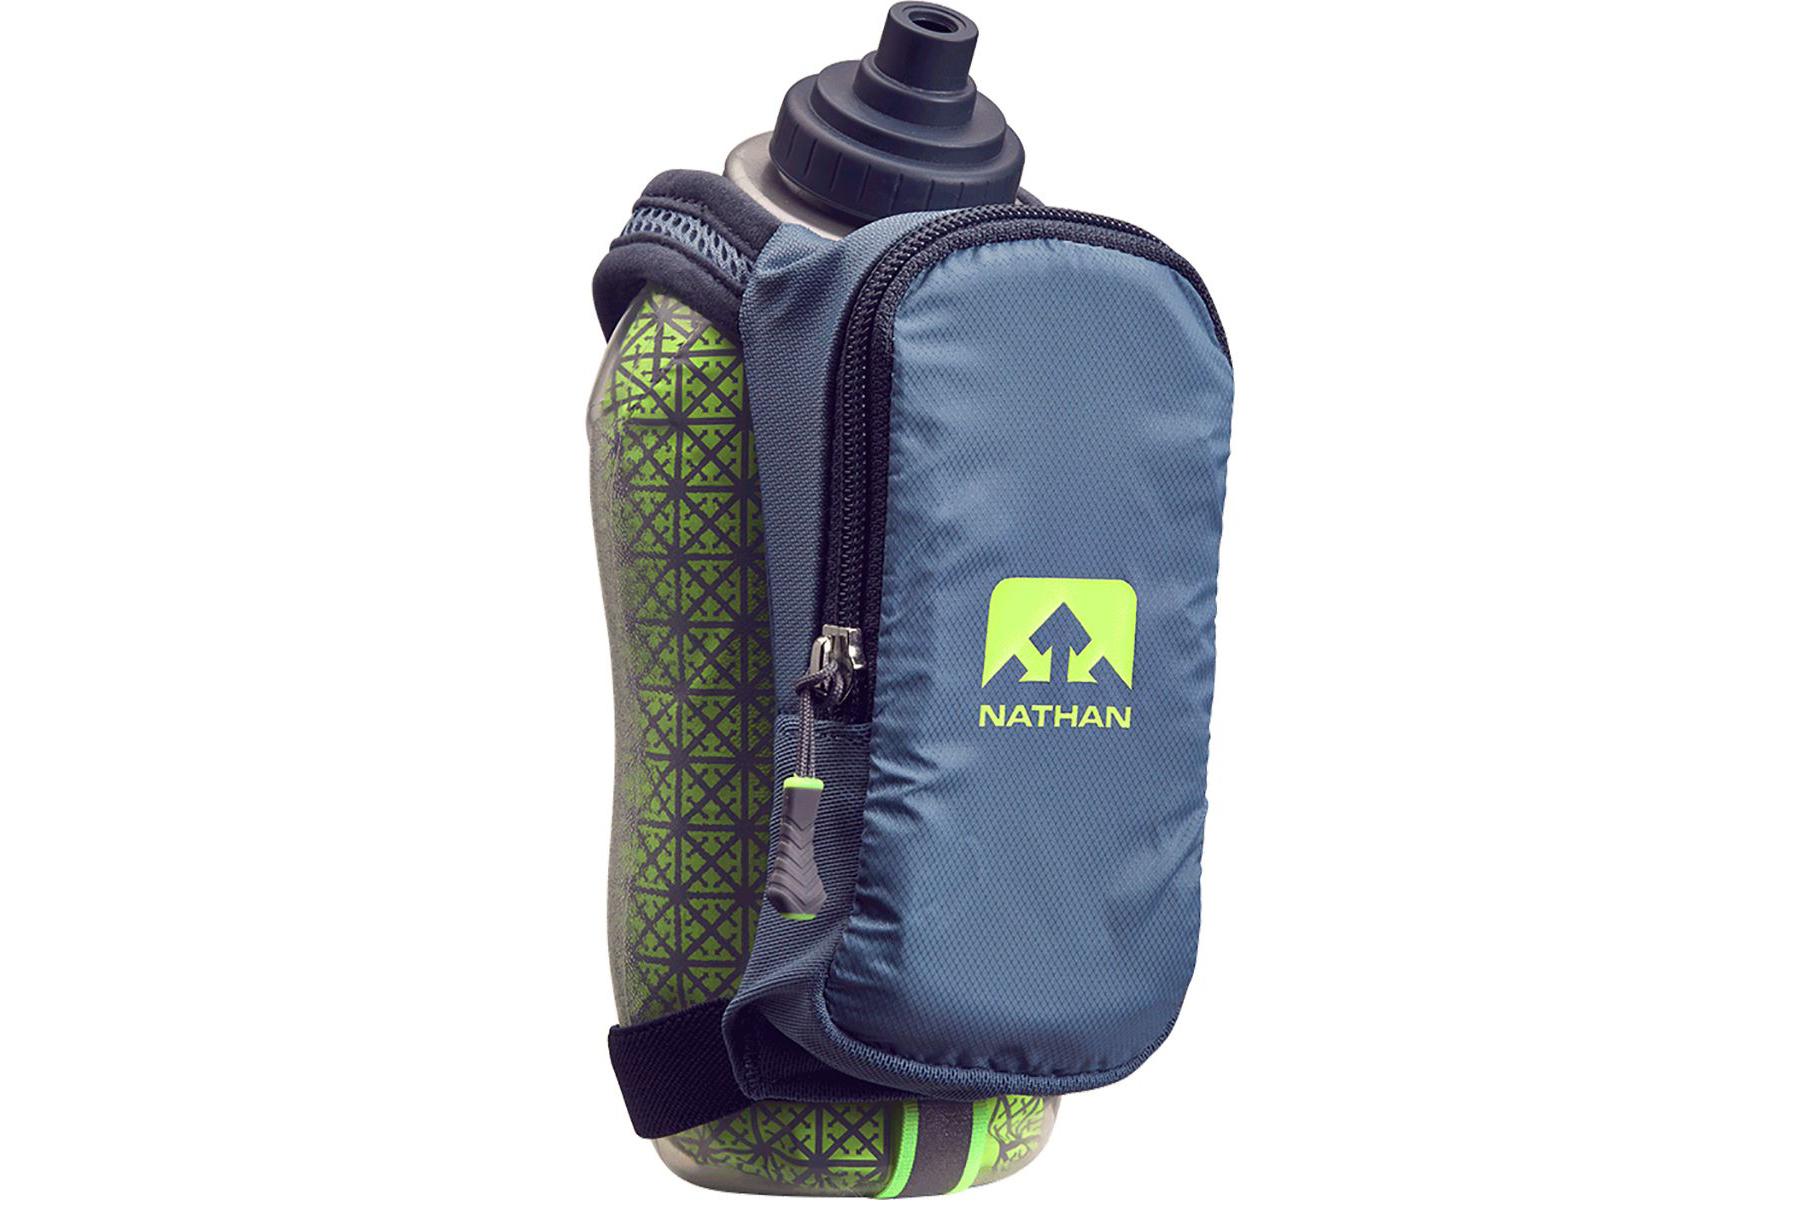 Nathan SpeedDraw Plus Insulated 18oz Water Bottle